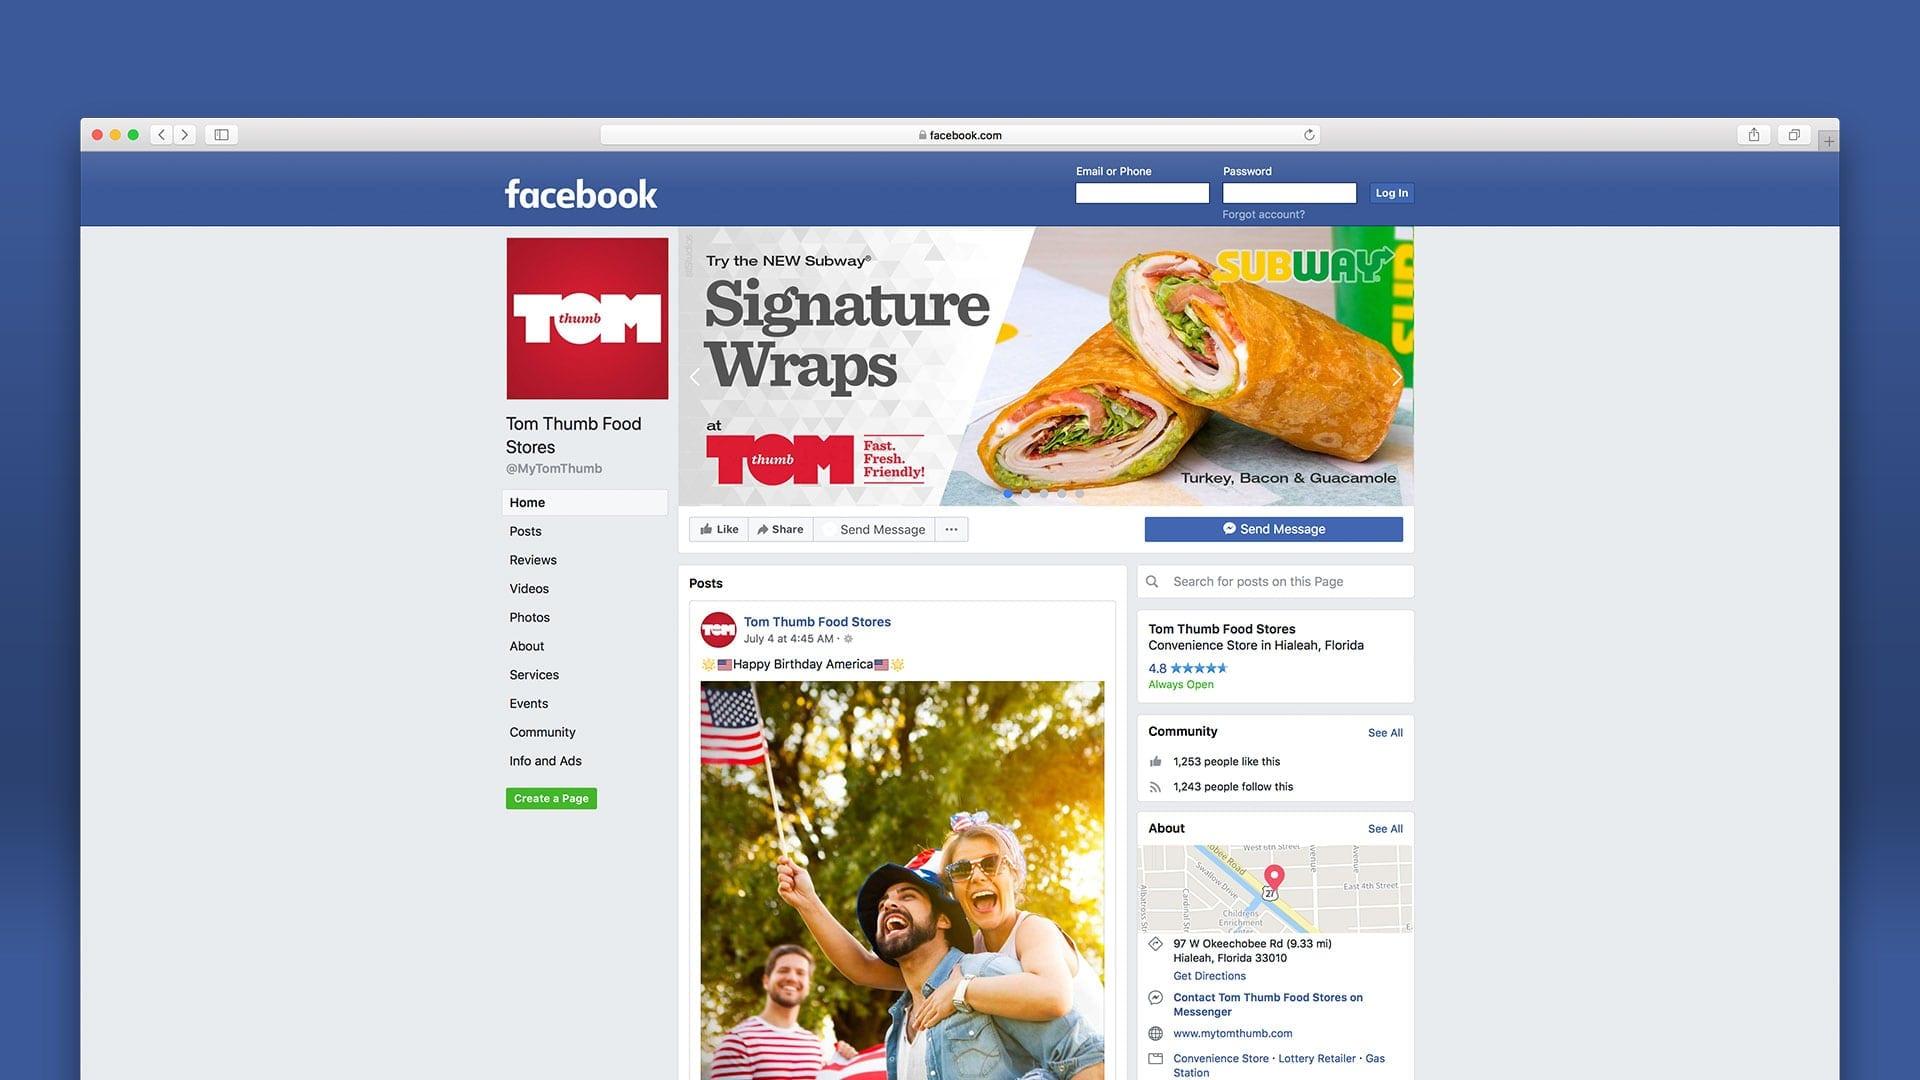 Tom Thumb Food Stores Digital & Social Media Marketing - sliStudios Miami Beach